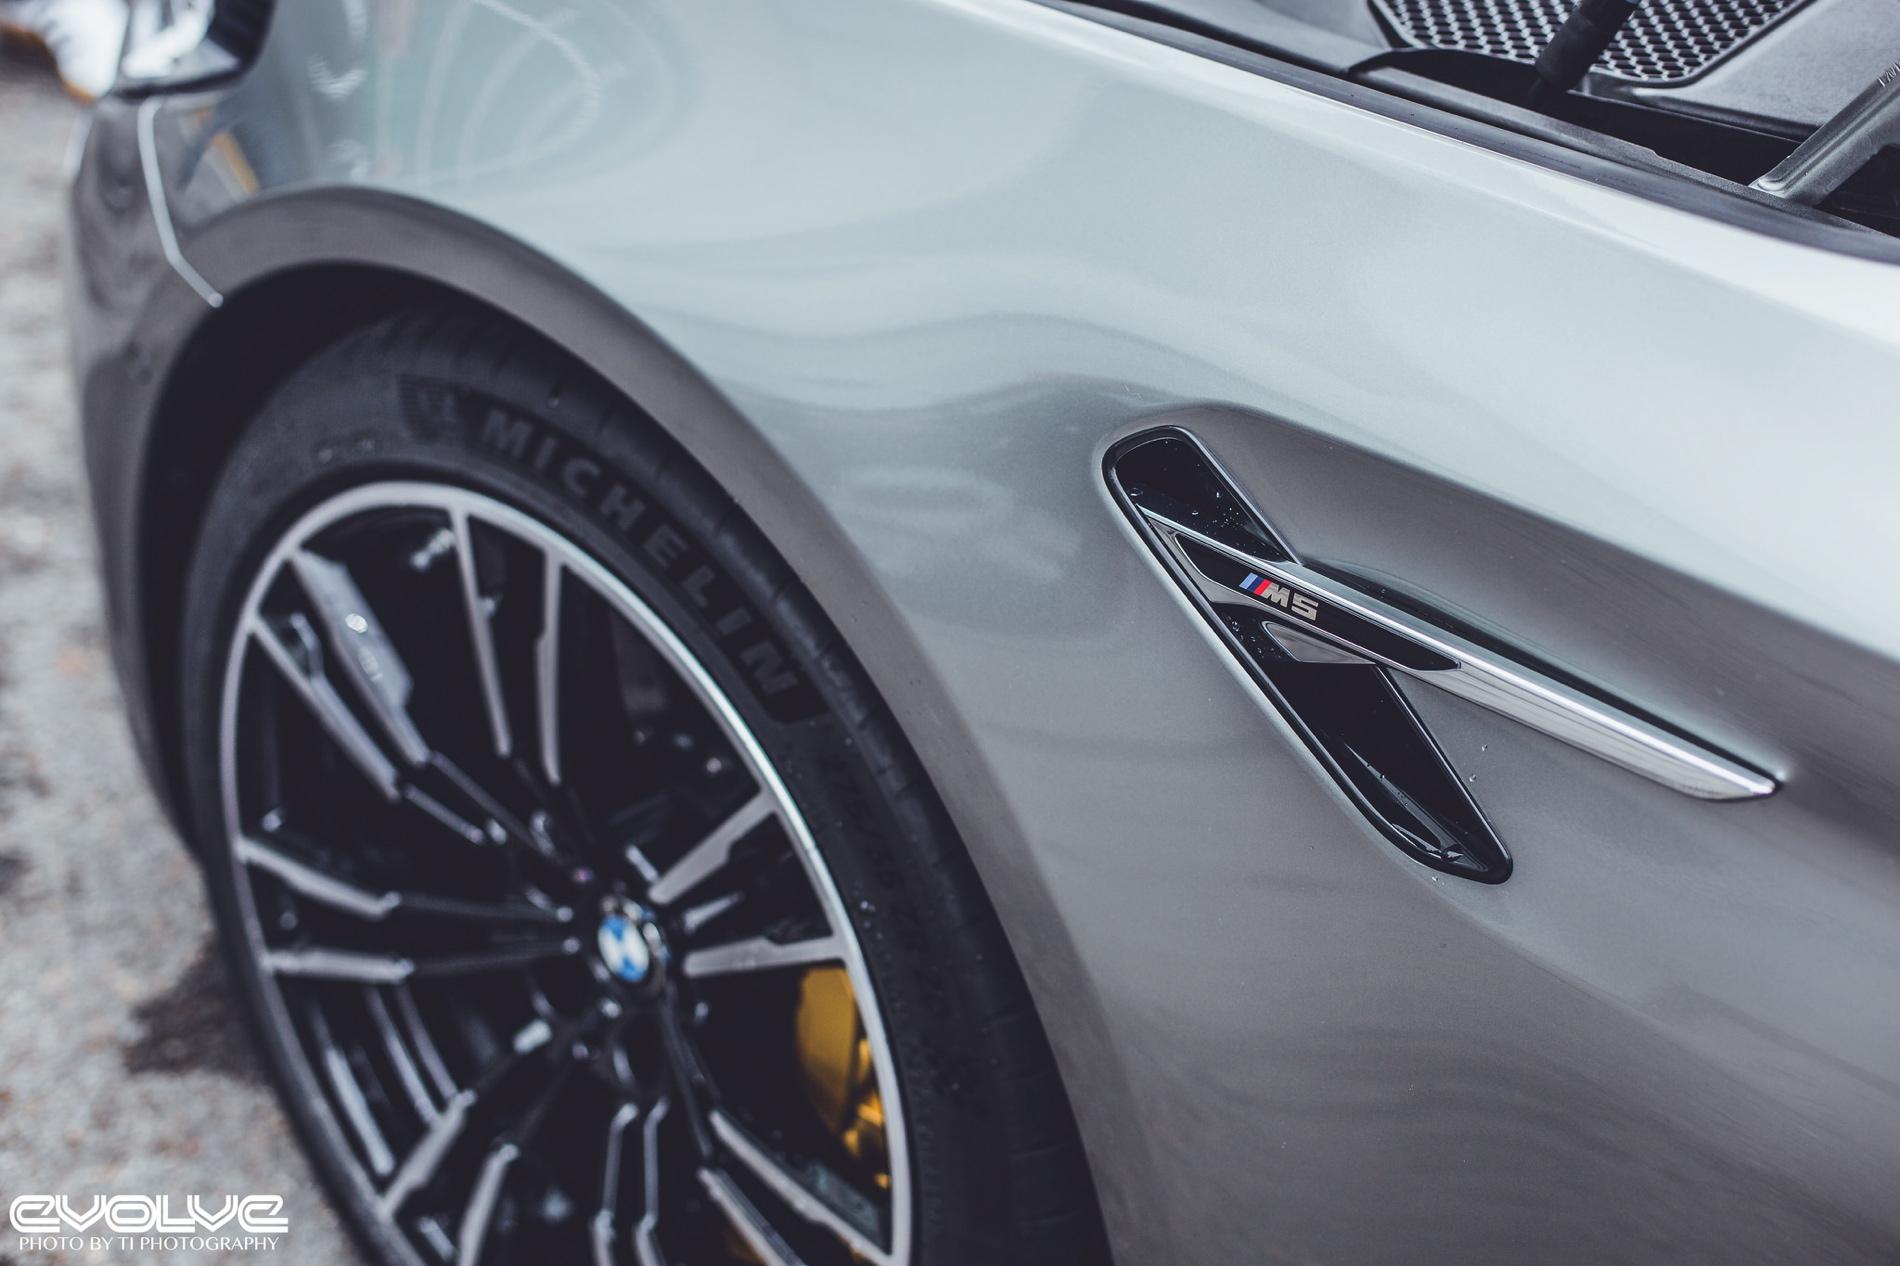 F90 Bmw M5 In Donington Grey Metallic Looks Stunning